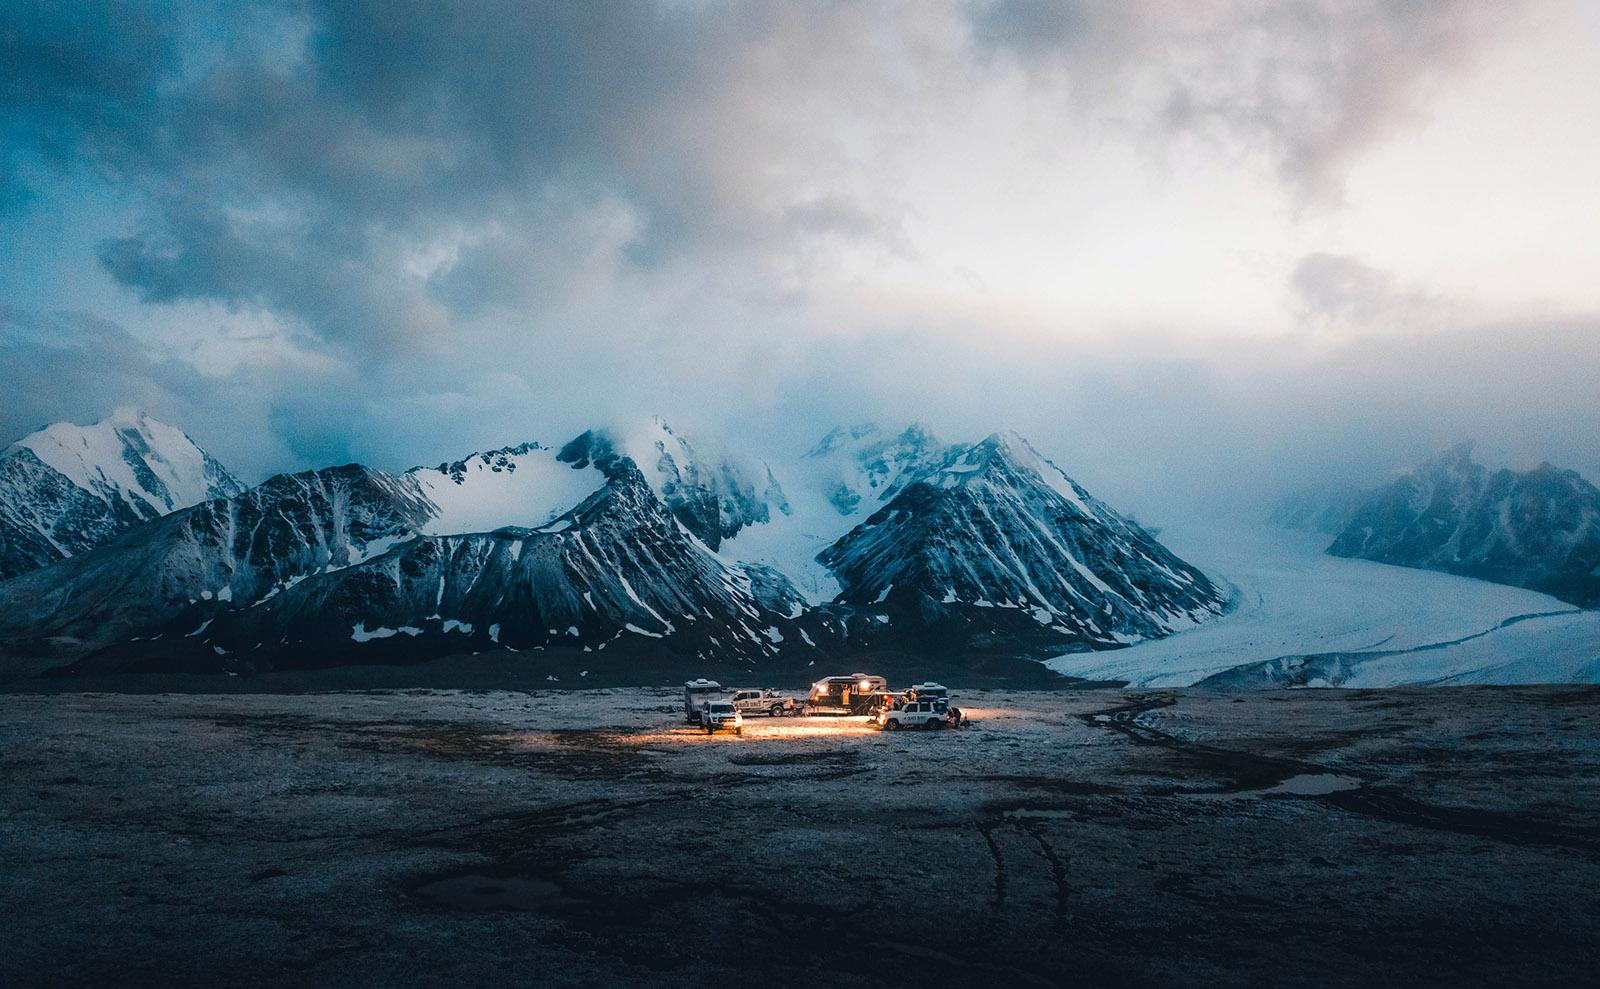 Global Picnics, Travel Trivia, SF/F Last Lines, Mongolia & More: Endnotes 25 September